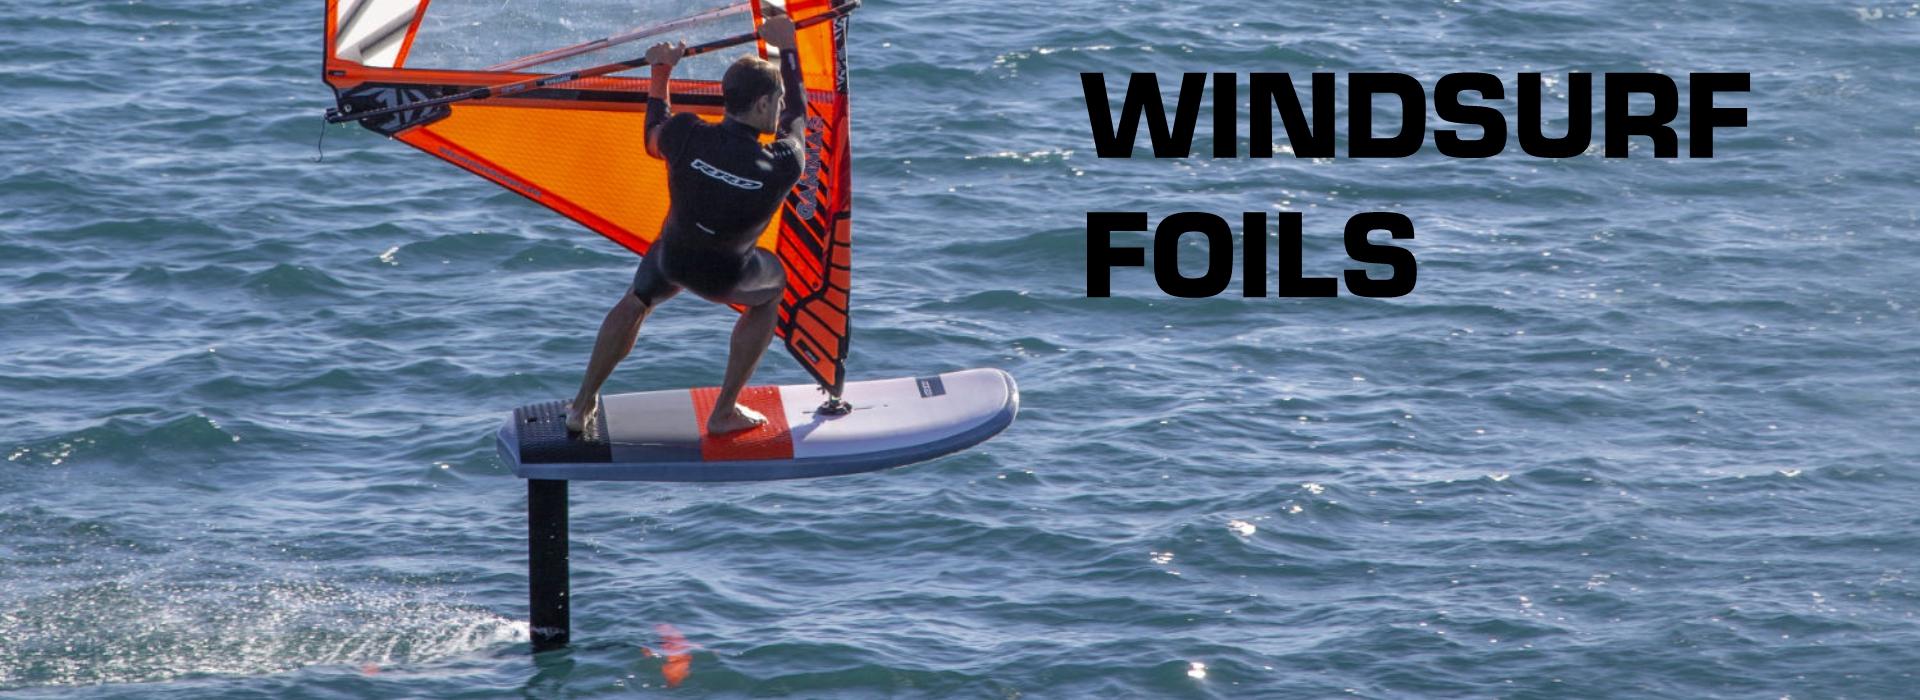 Windsurffoil